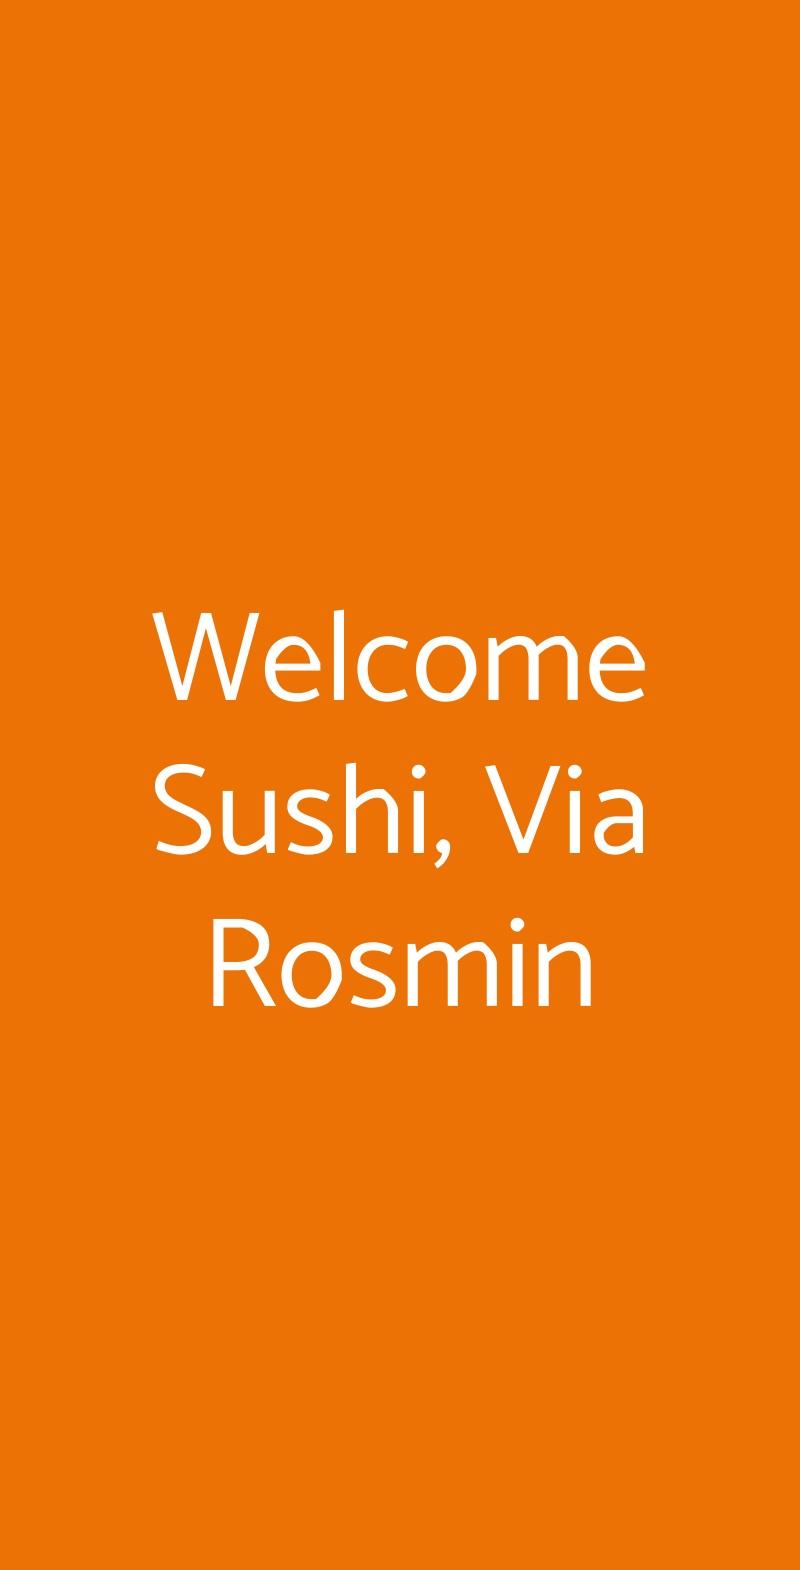 Welcome Sushi Milano menù 1 pagina